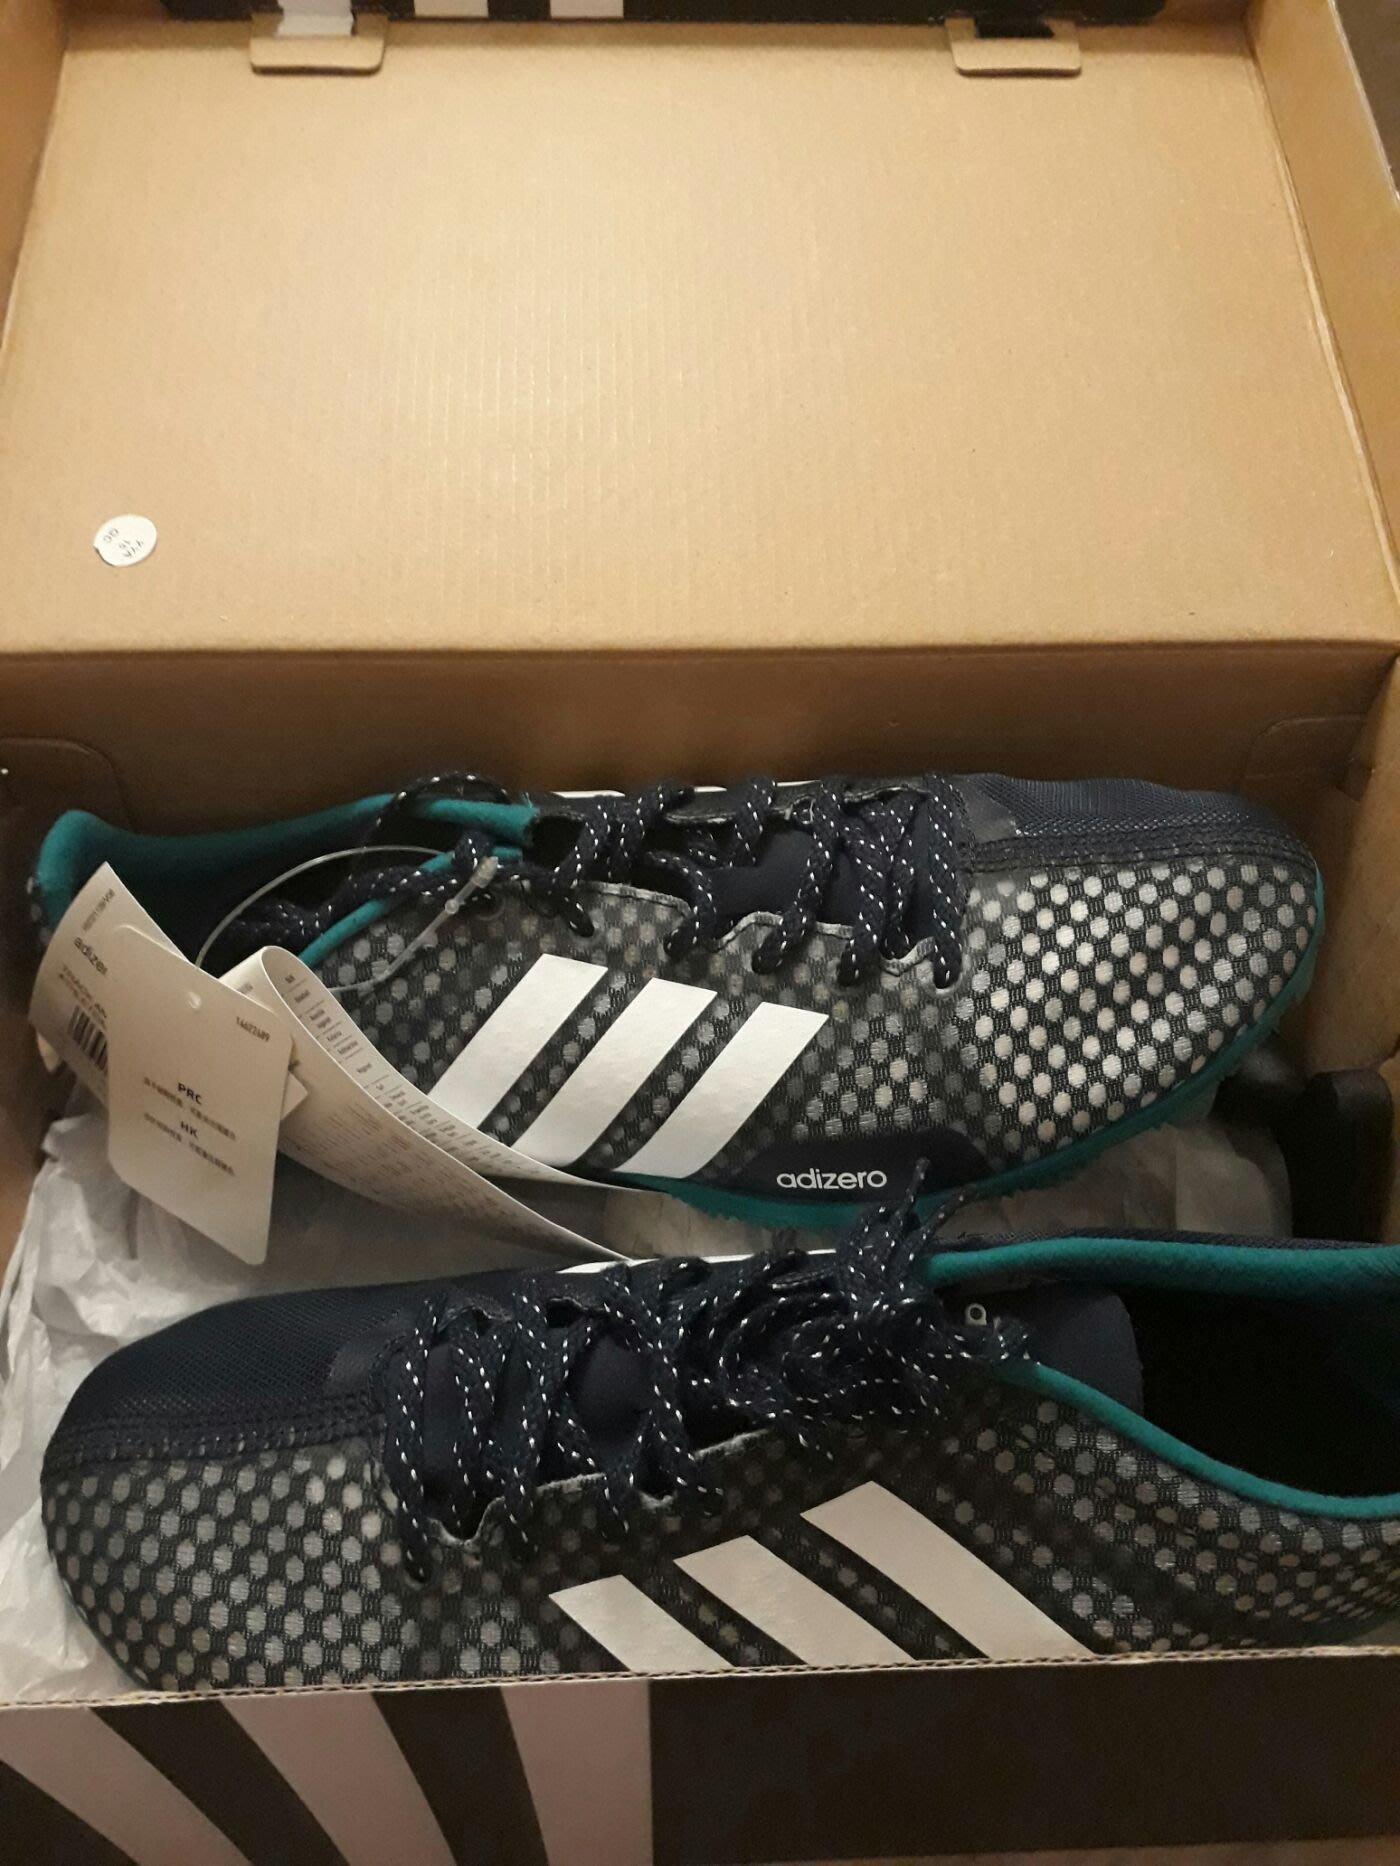 Adidas adizero ambition 3 w 中長距離田徑釘鞋